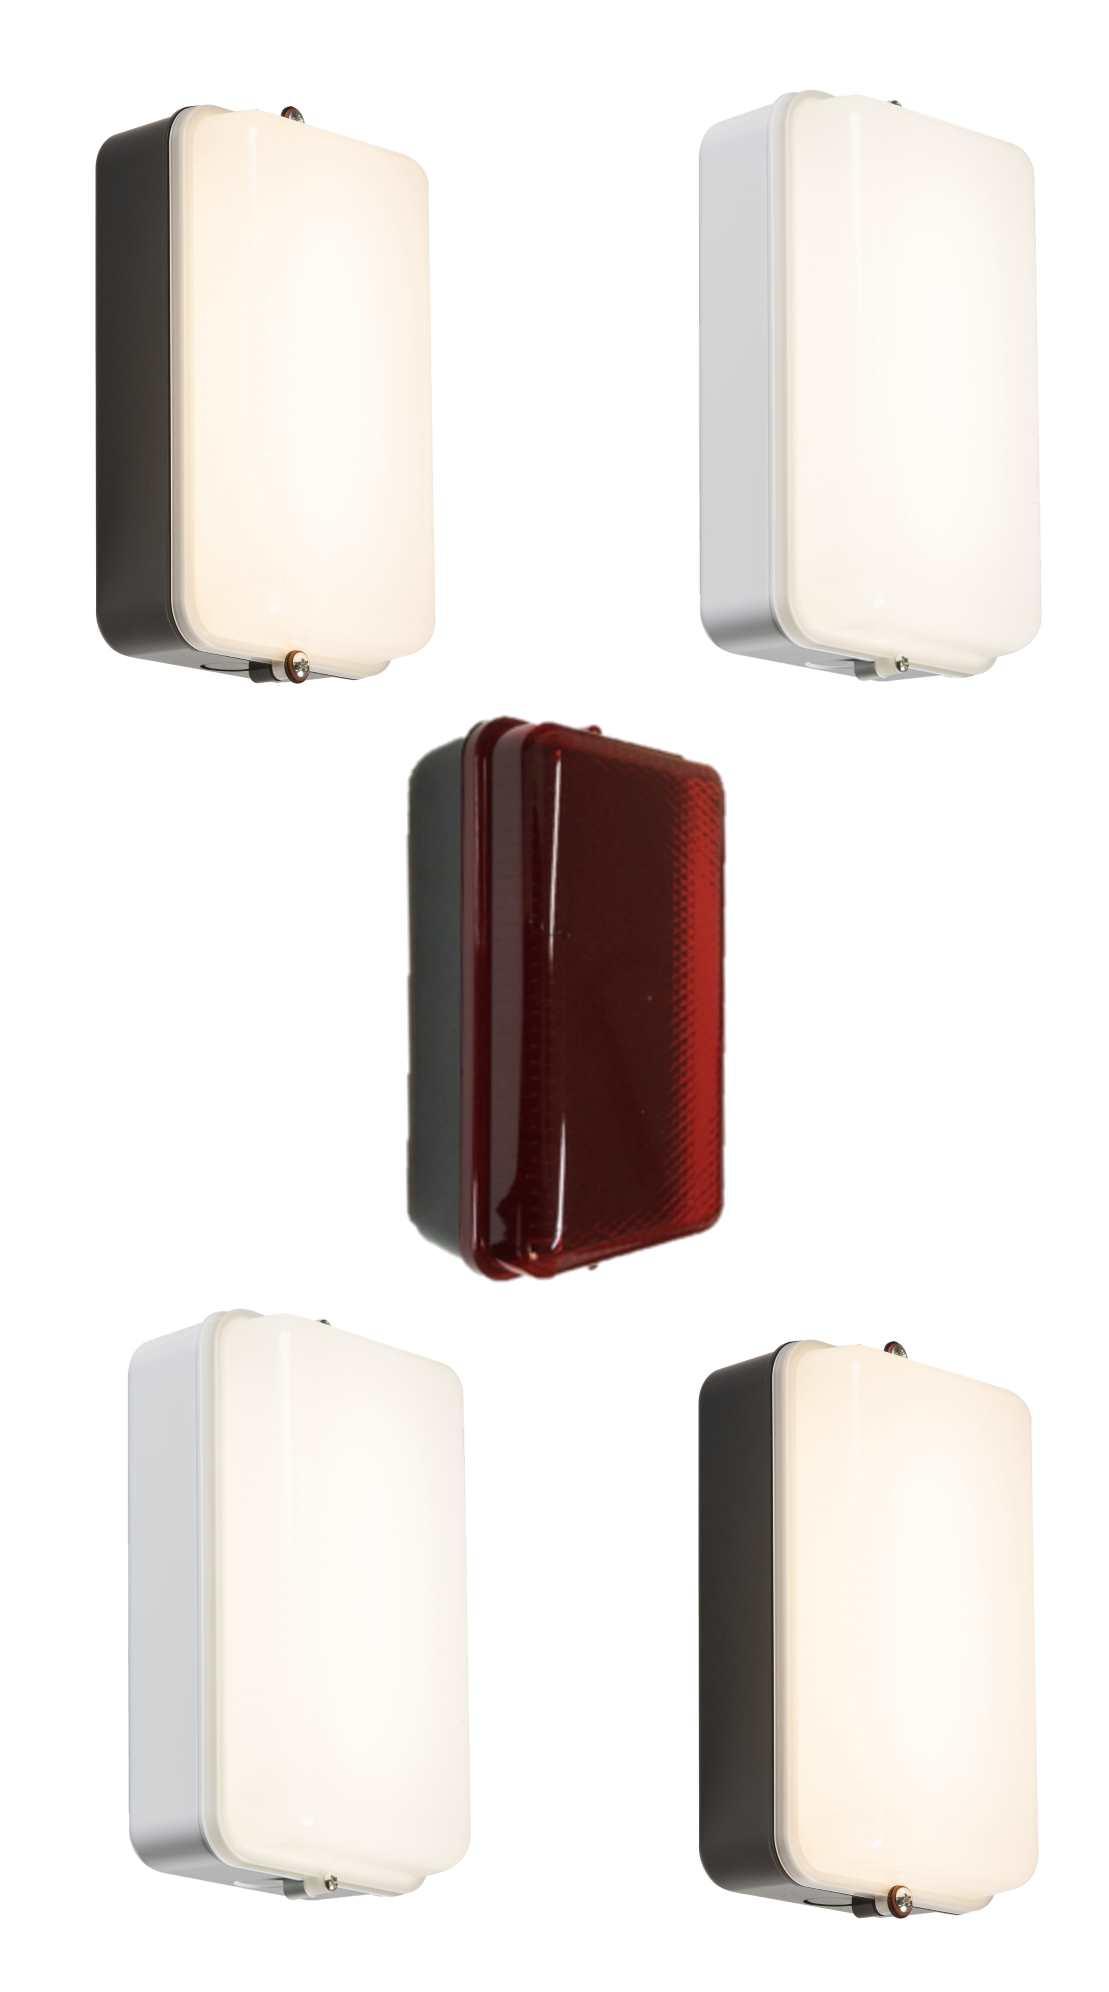 Knightsbridge Led Amenity Lighting Bulkheads Ip54 Standard And With Sensor